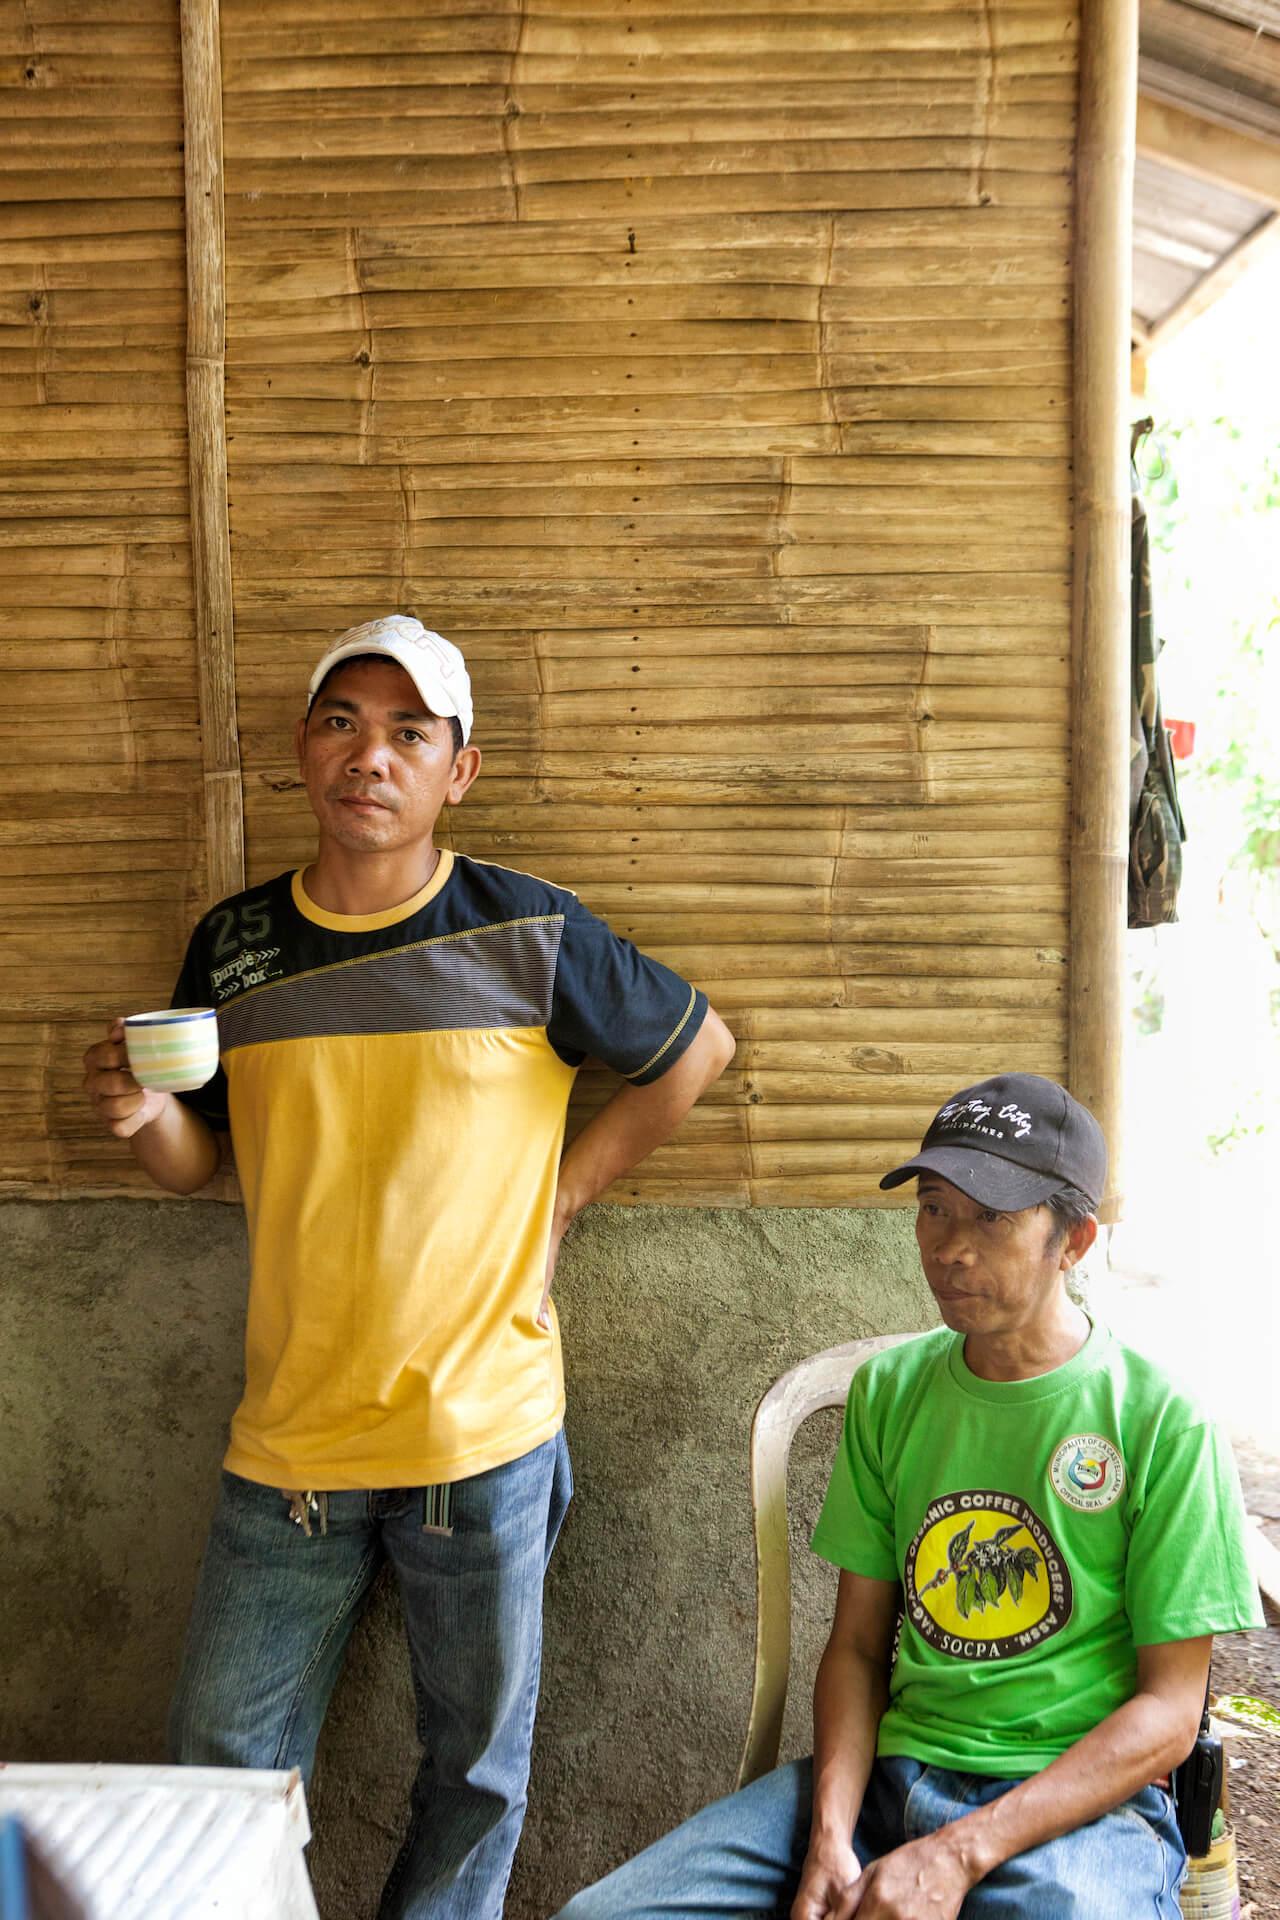 Manong John and Manong Vic Labrador, organic coffee farmers from La Castellana